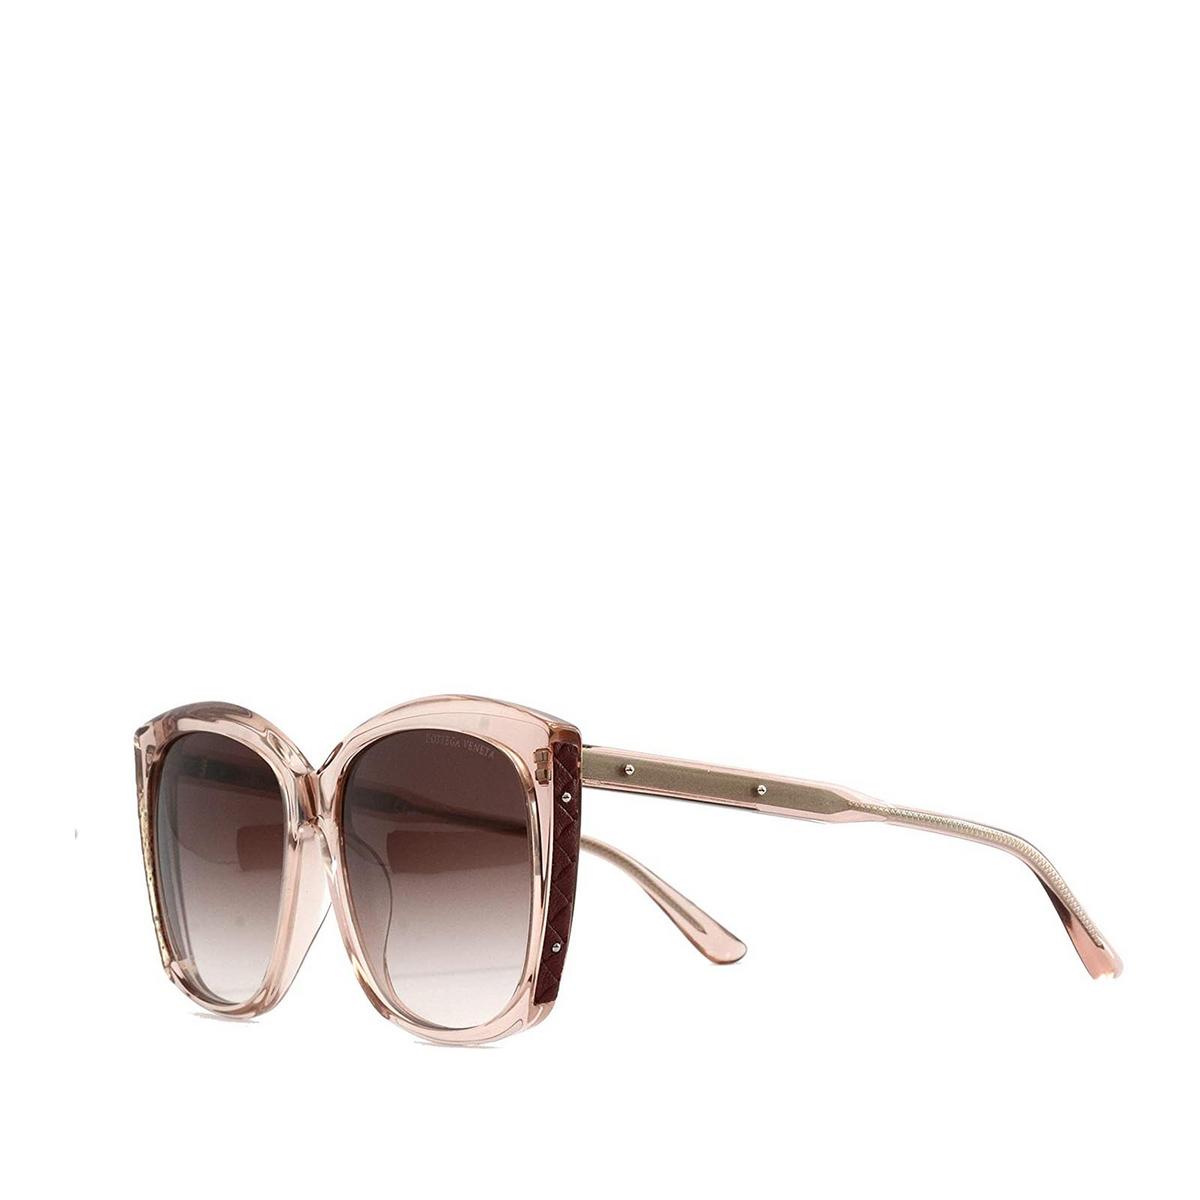 Bottega Veneta® Square Sunglasses: BV0182S color Transparent Pink 004 - three-quarters view.